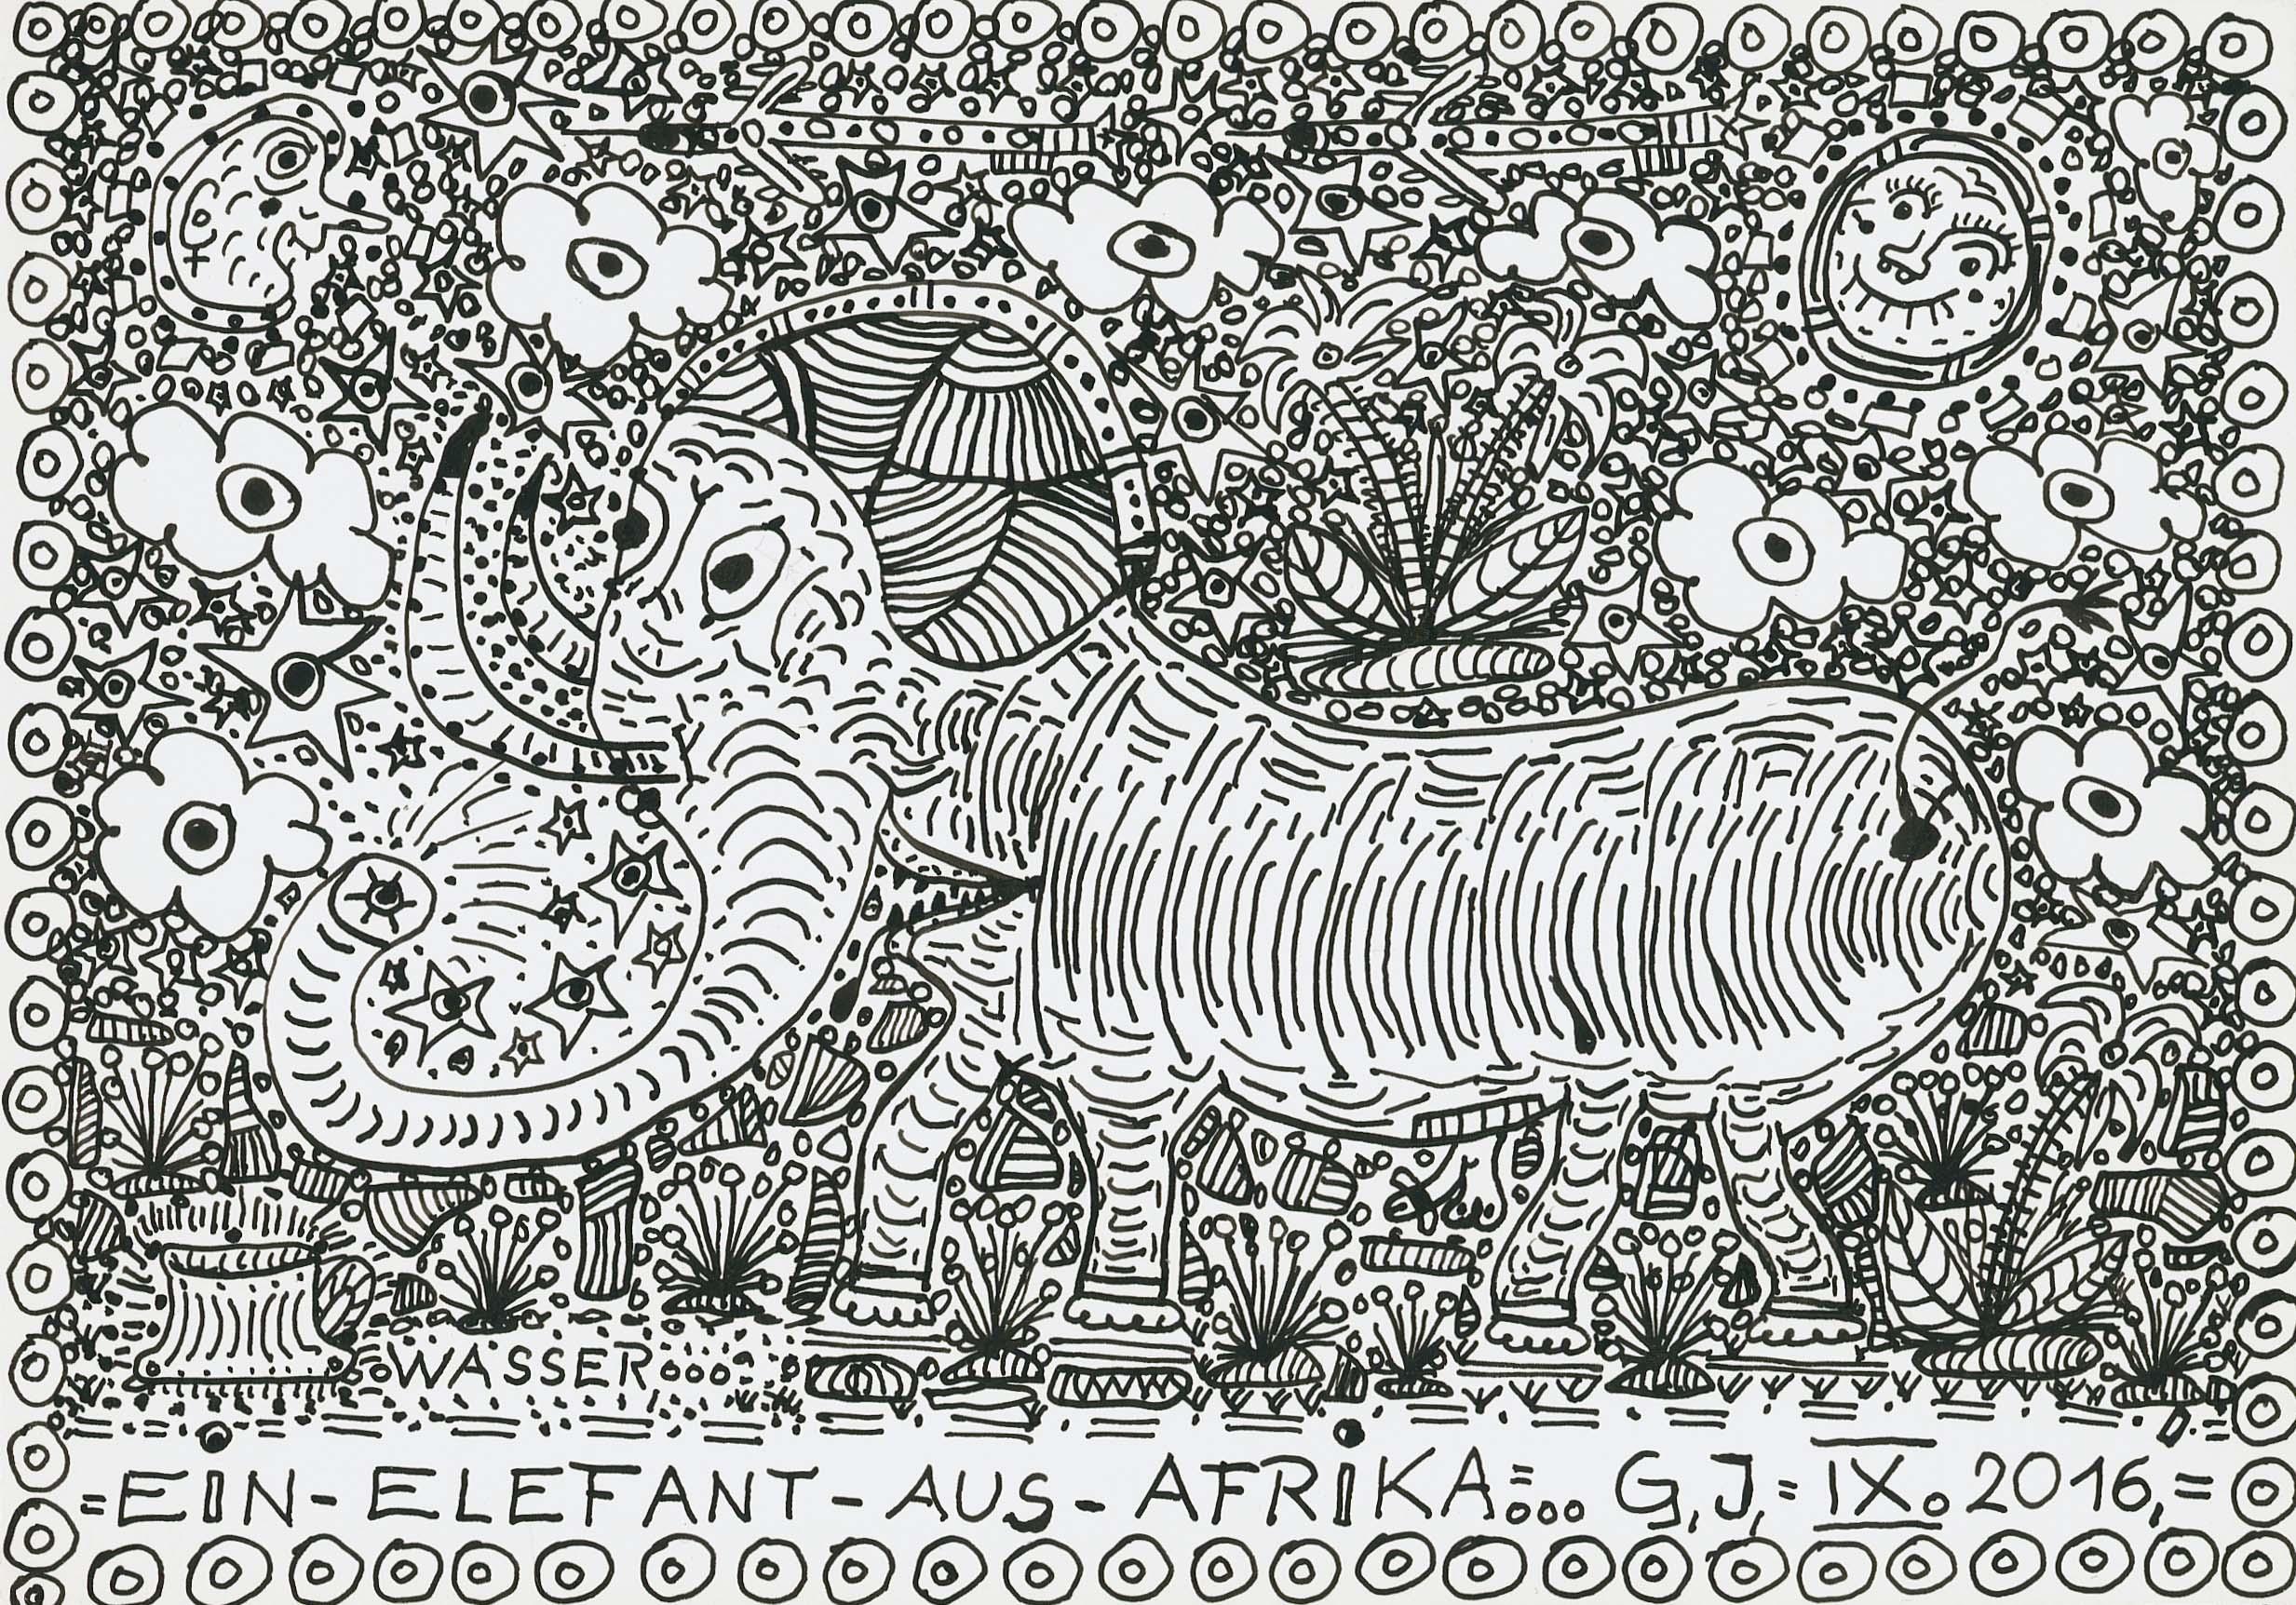 garber johann - EIN-ELEFANT-AUS-AFRIKA / AN-ELEPHANT-FROM-AFRICA